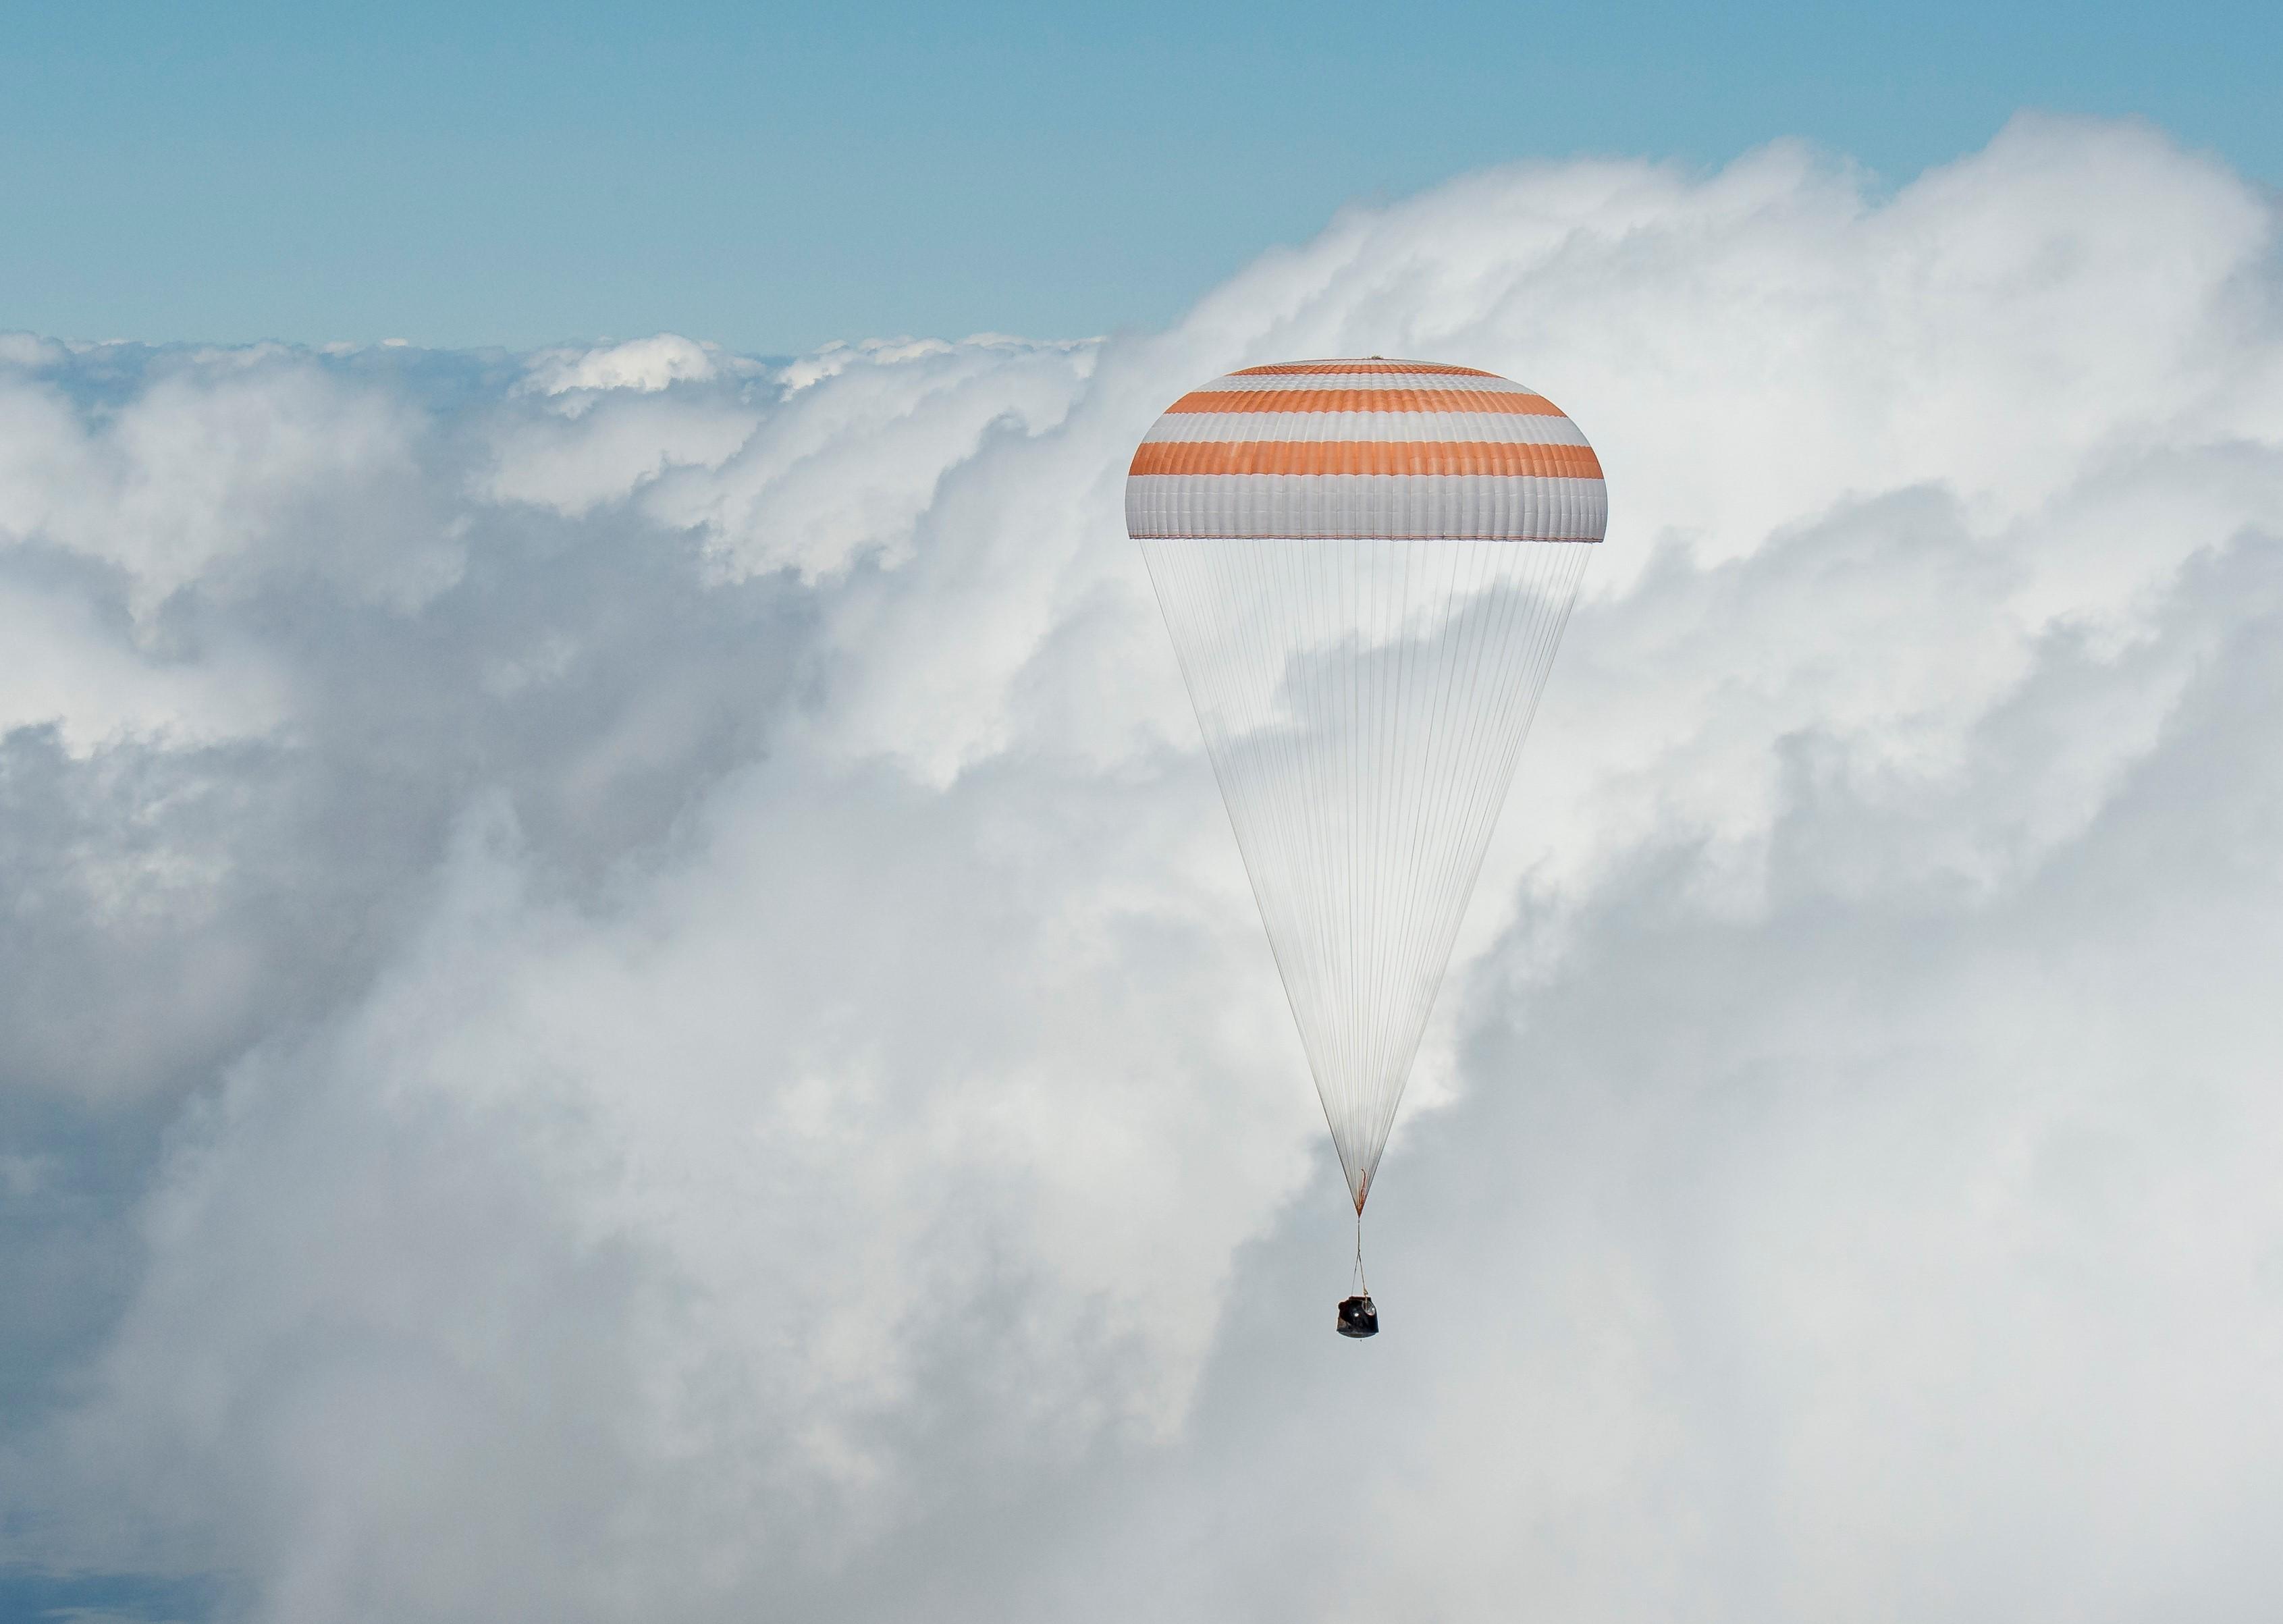 Soyuz TMA-19M Space Capsule Under Parachutes